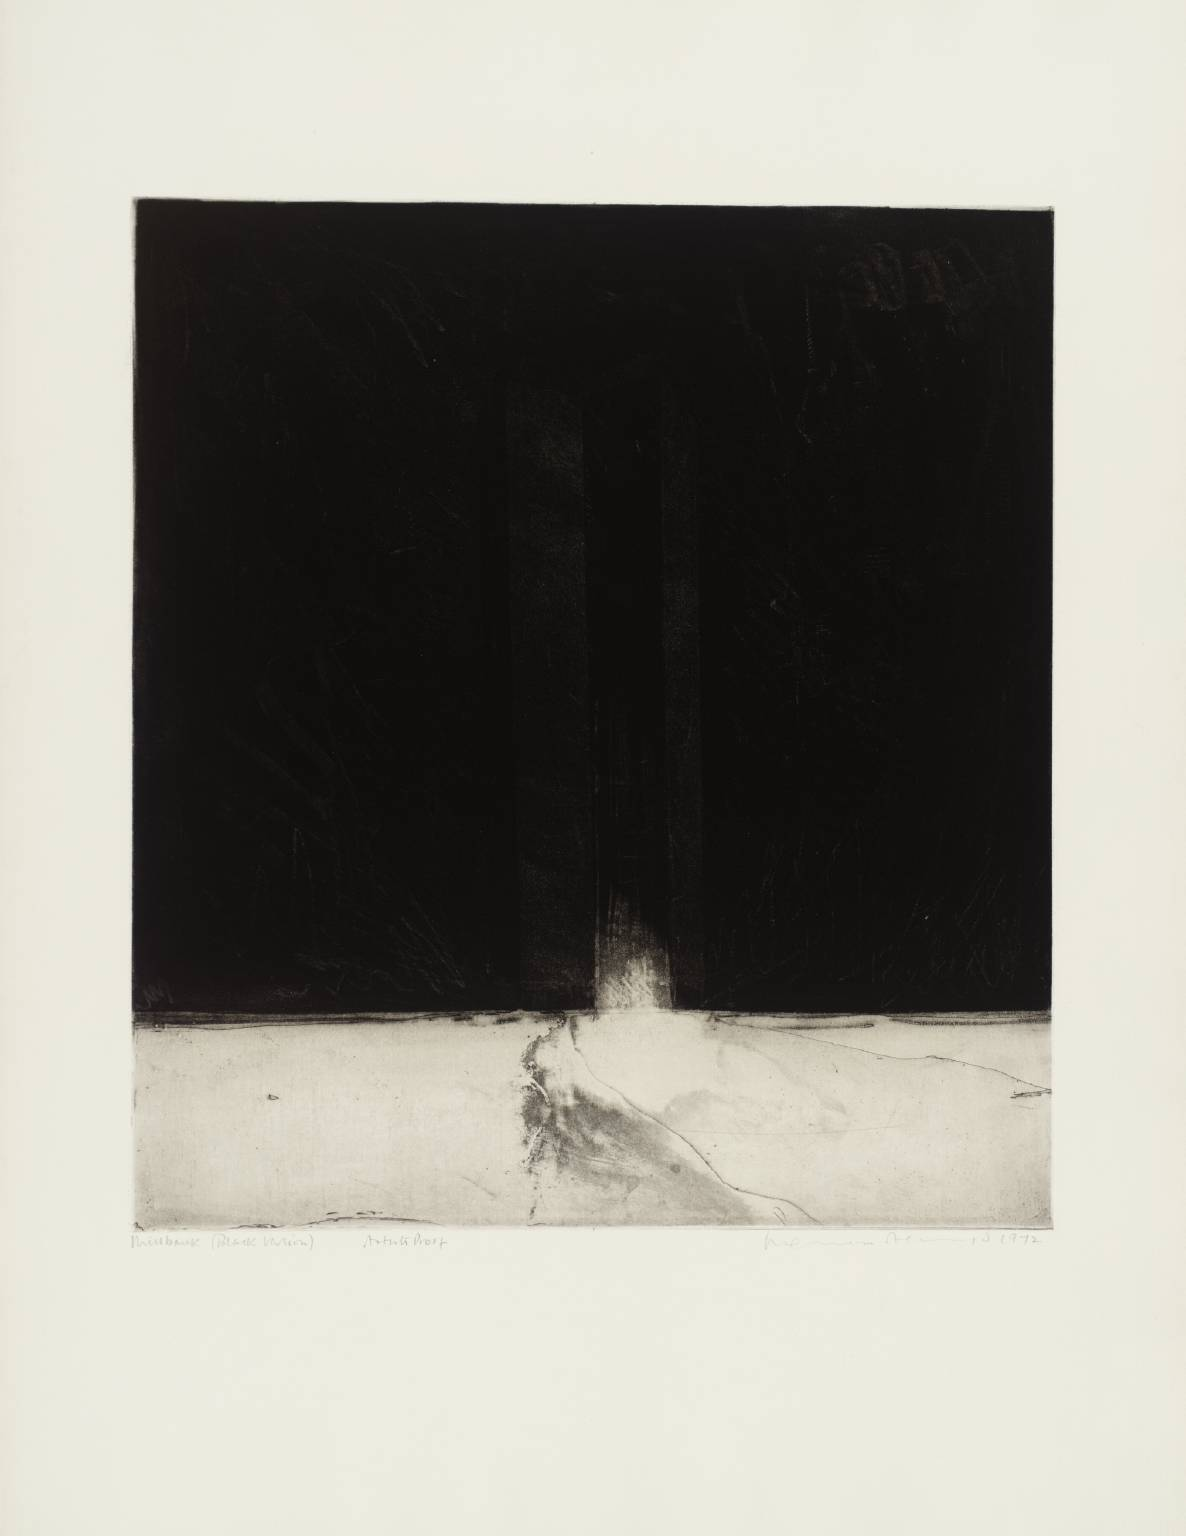 Millbank, Black Version, 1972